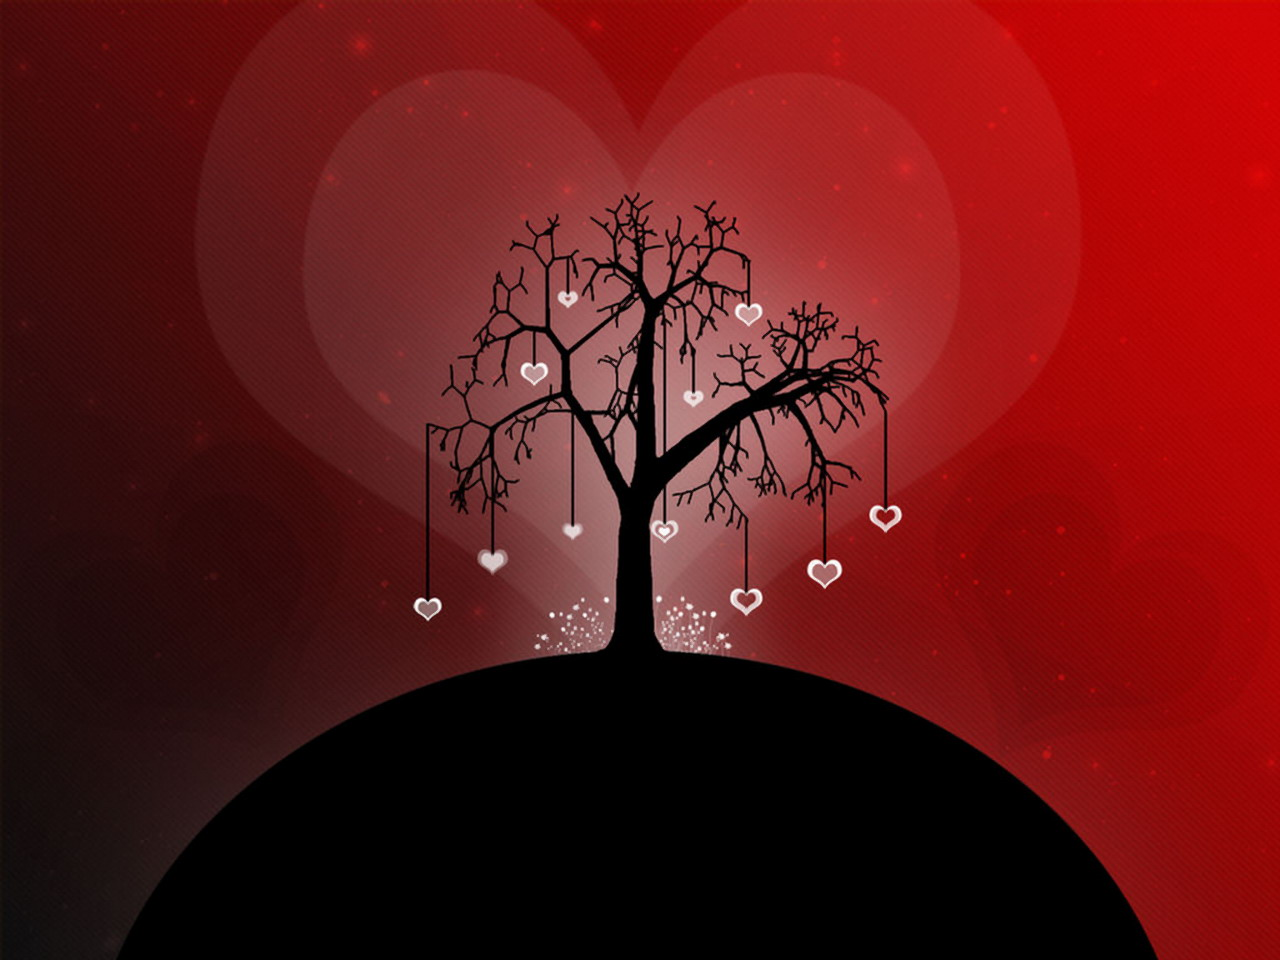 Love Wallpaper Full Hd New : New Love Wallpapers Full HD - WallpaperSafari